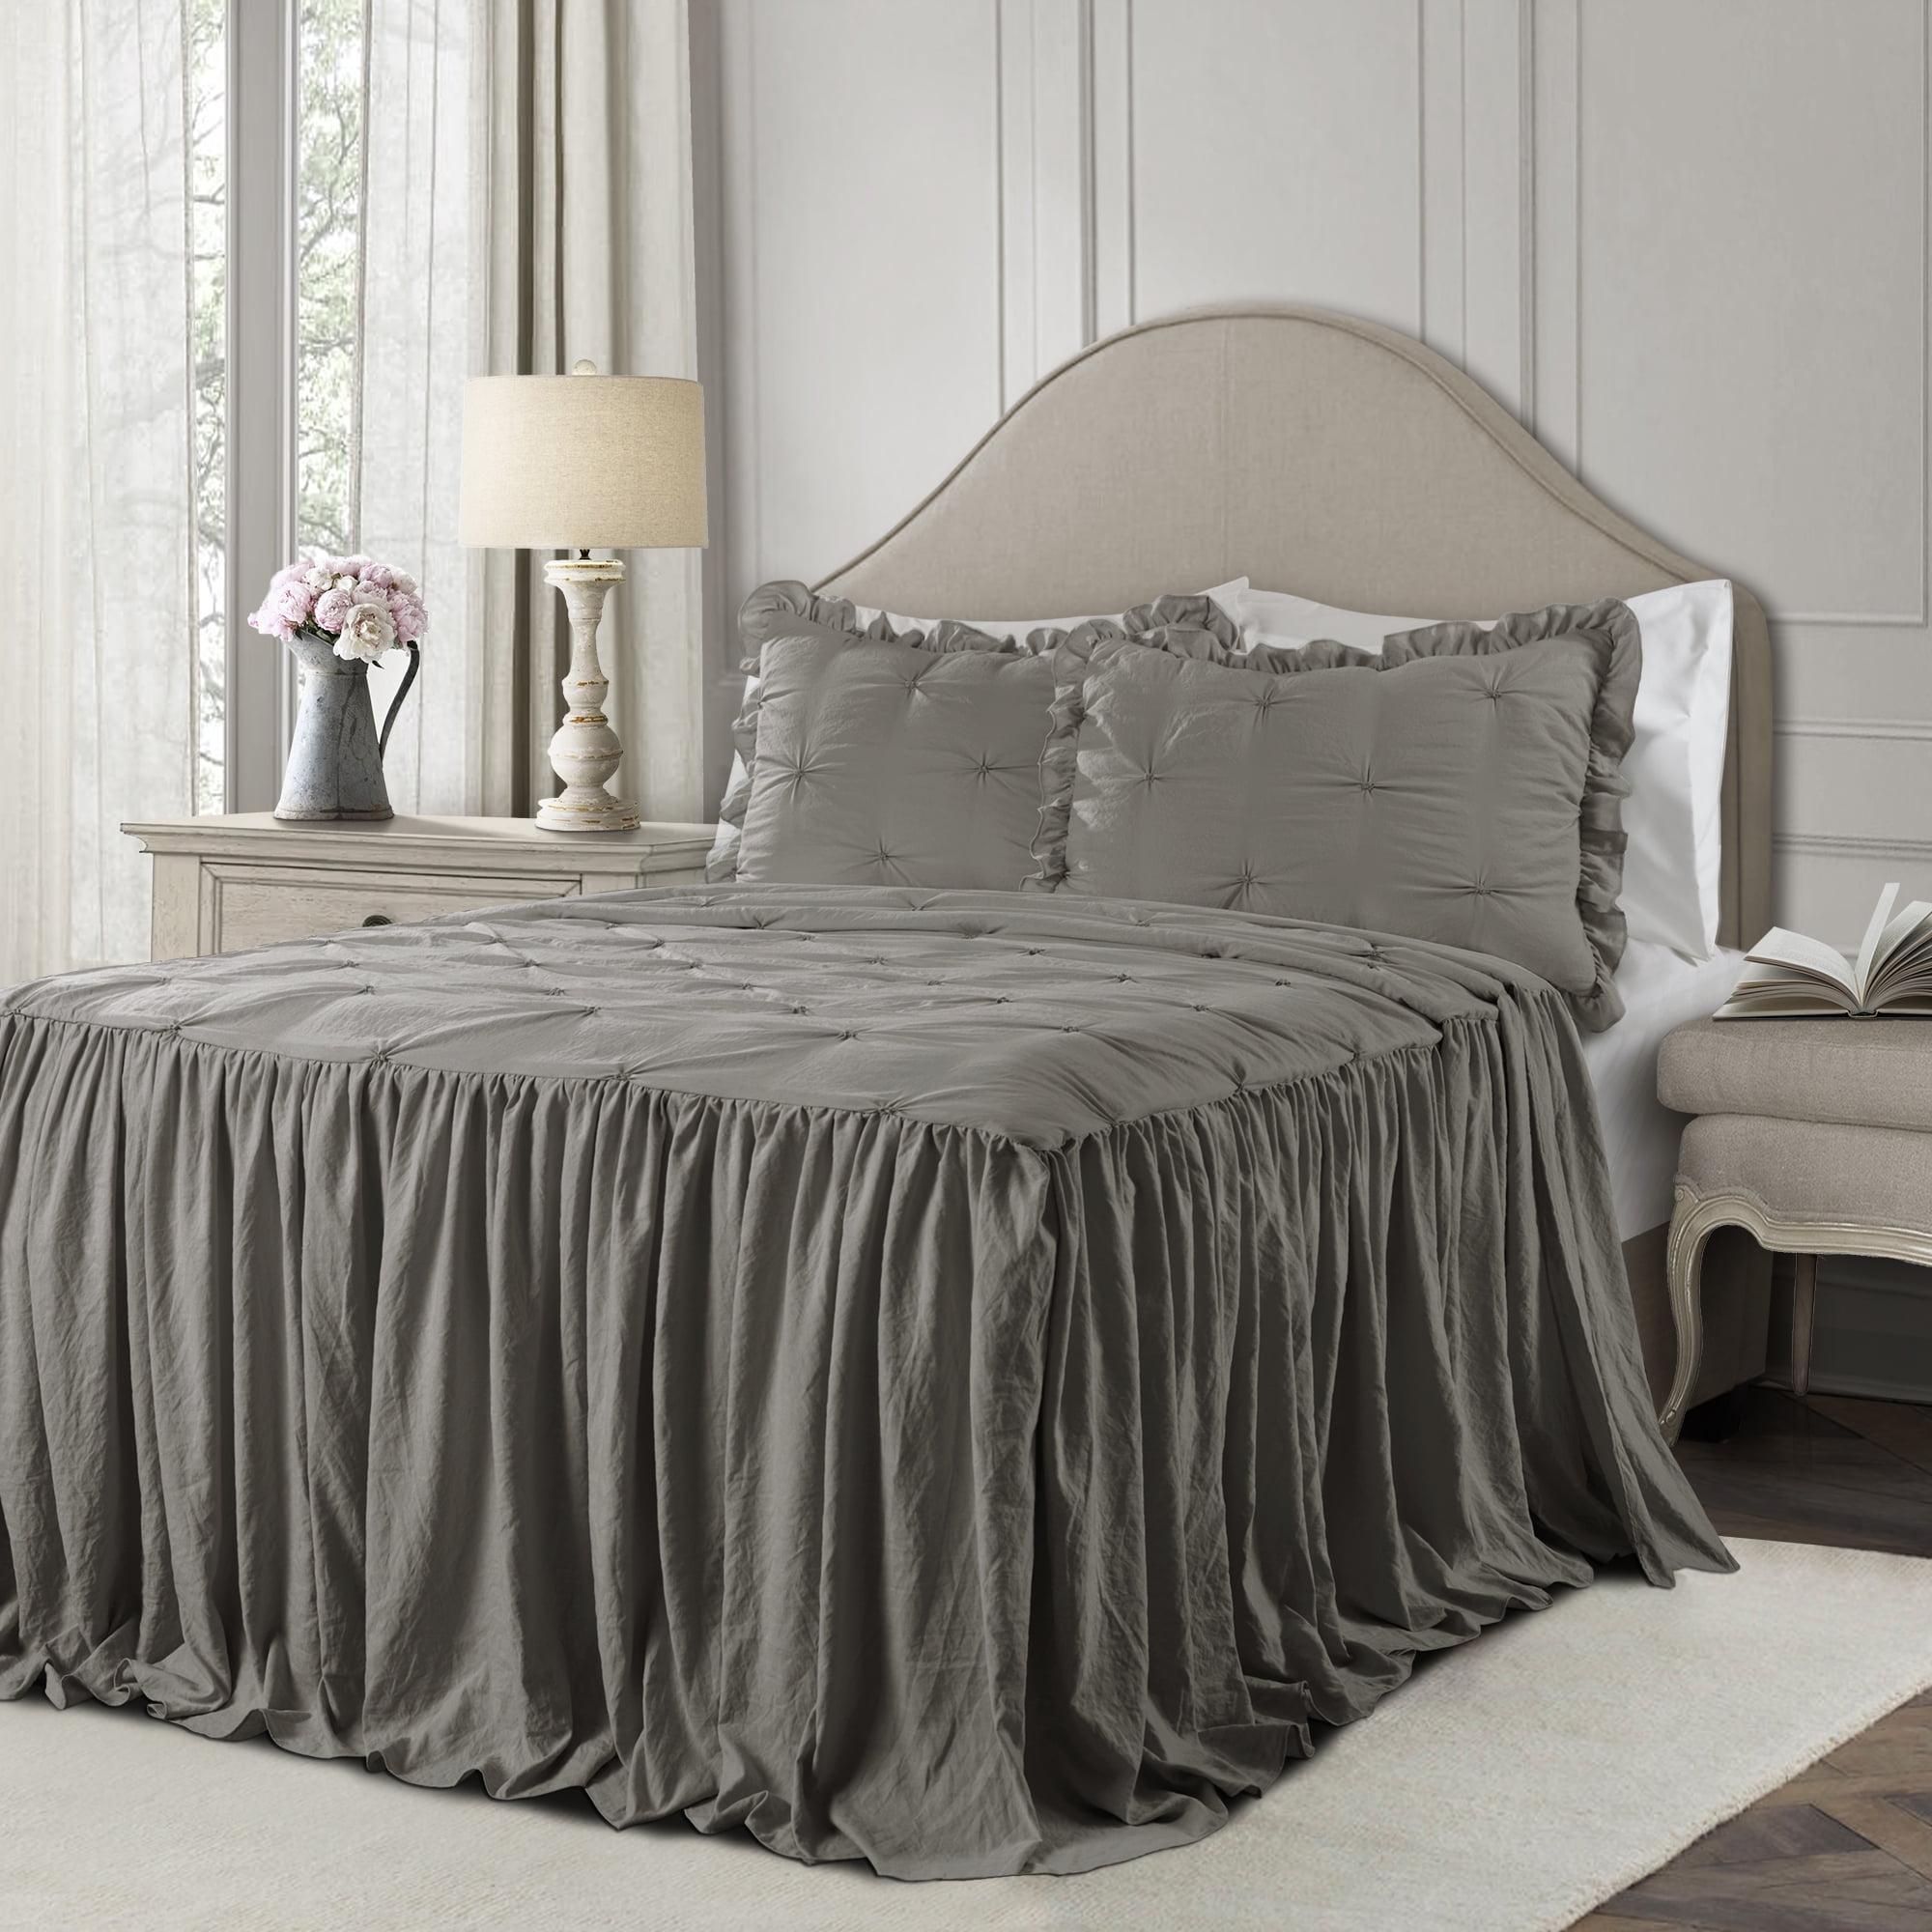 Lush Decor Ravello Pintuck Polyester Bedspread, King, Dark Gray, 3-Pc Set